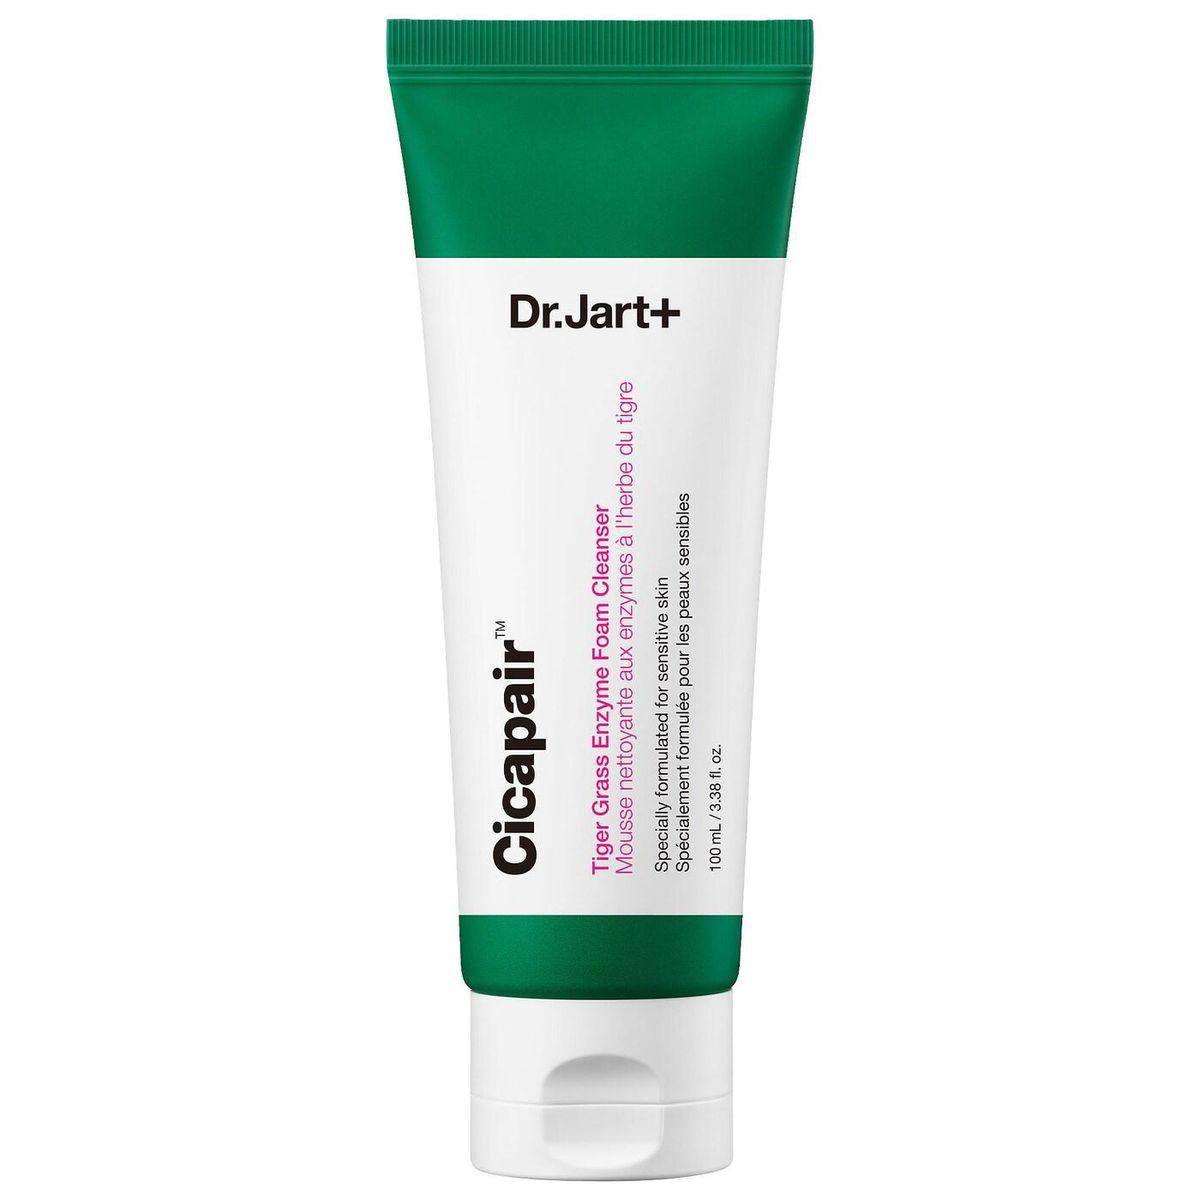 dr jart plus cicapair tiger grass enzyme foam cleanser